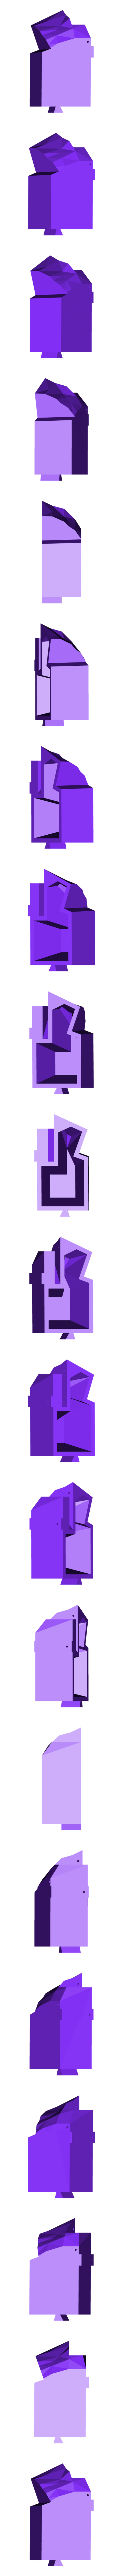 Classes coupler  bedrock .stl Download free STL file Hogwarts School of Witchcraft • 3D printer template, Valient